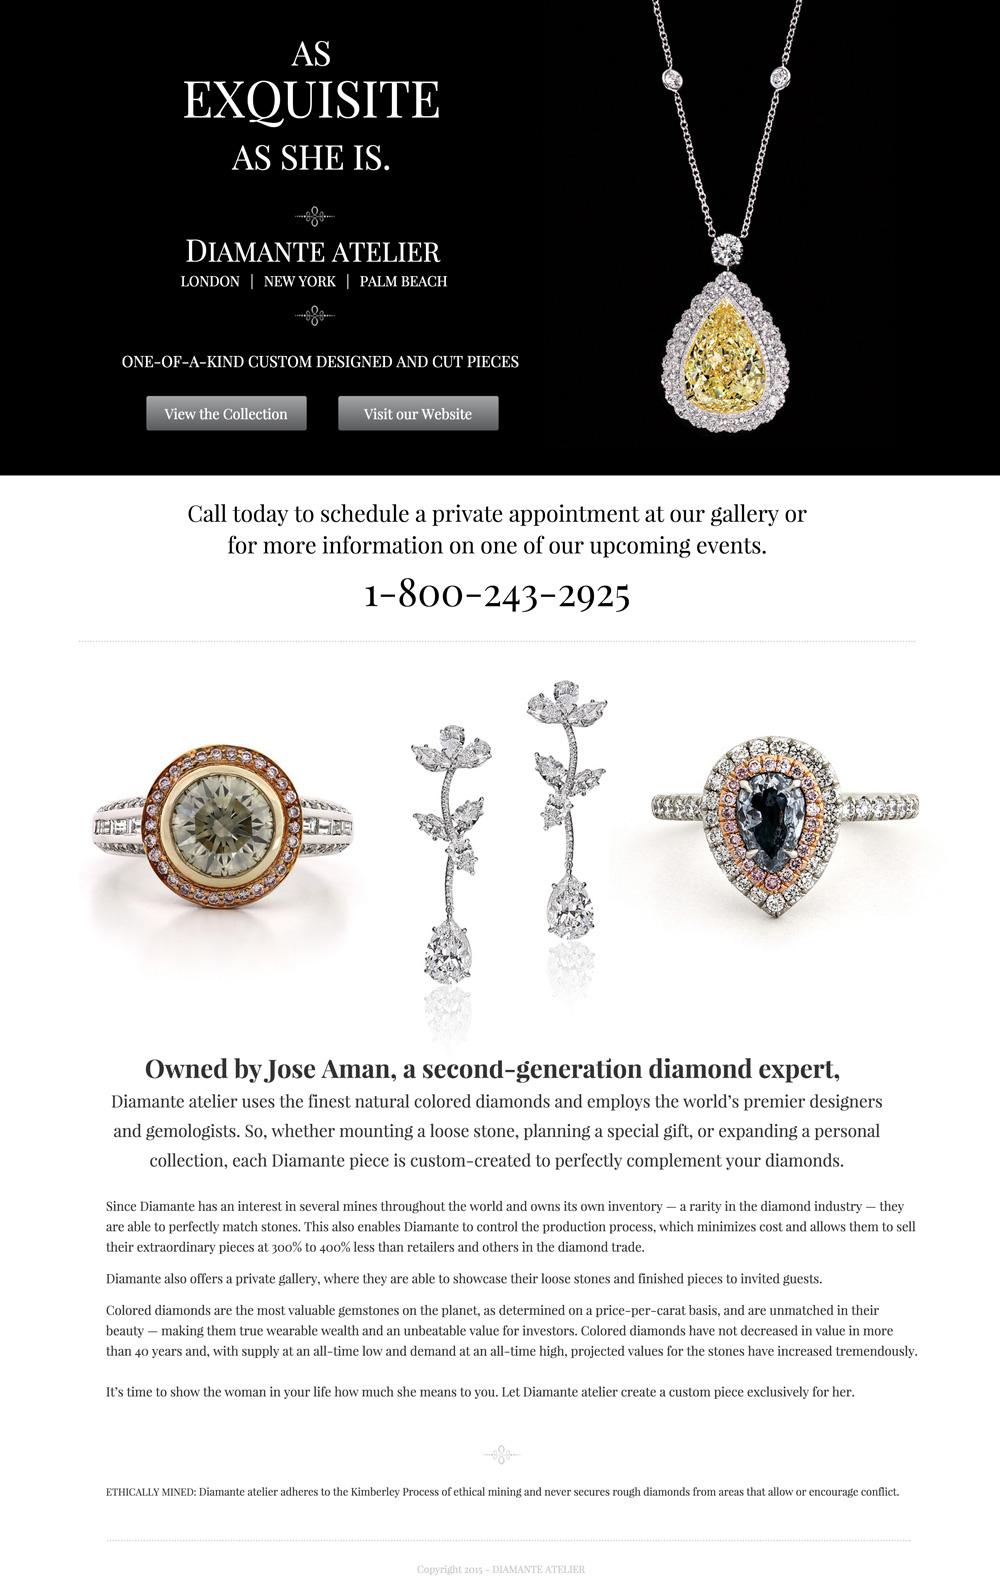 collection.diamanteatelier.com-exquisite-necklace-.jpg